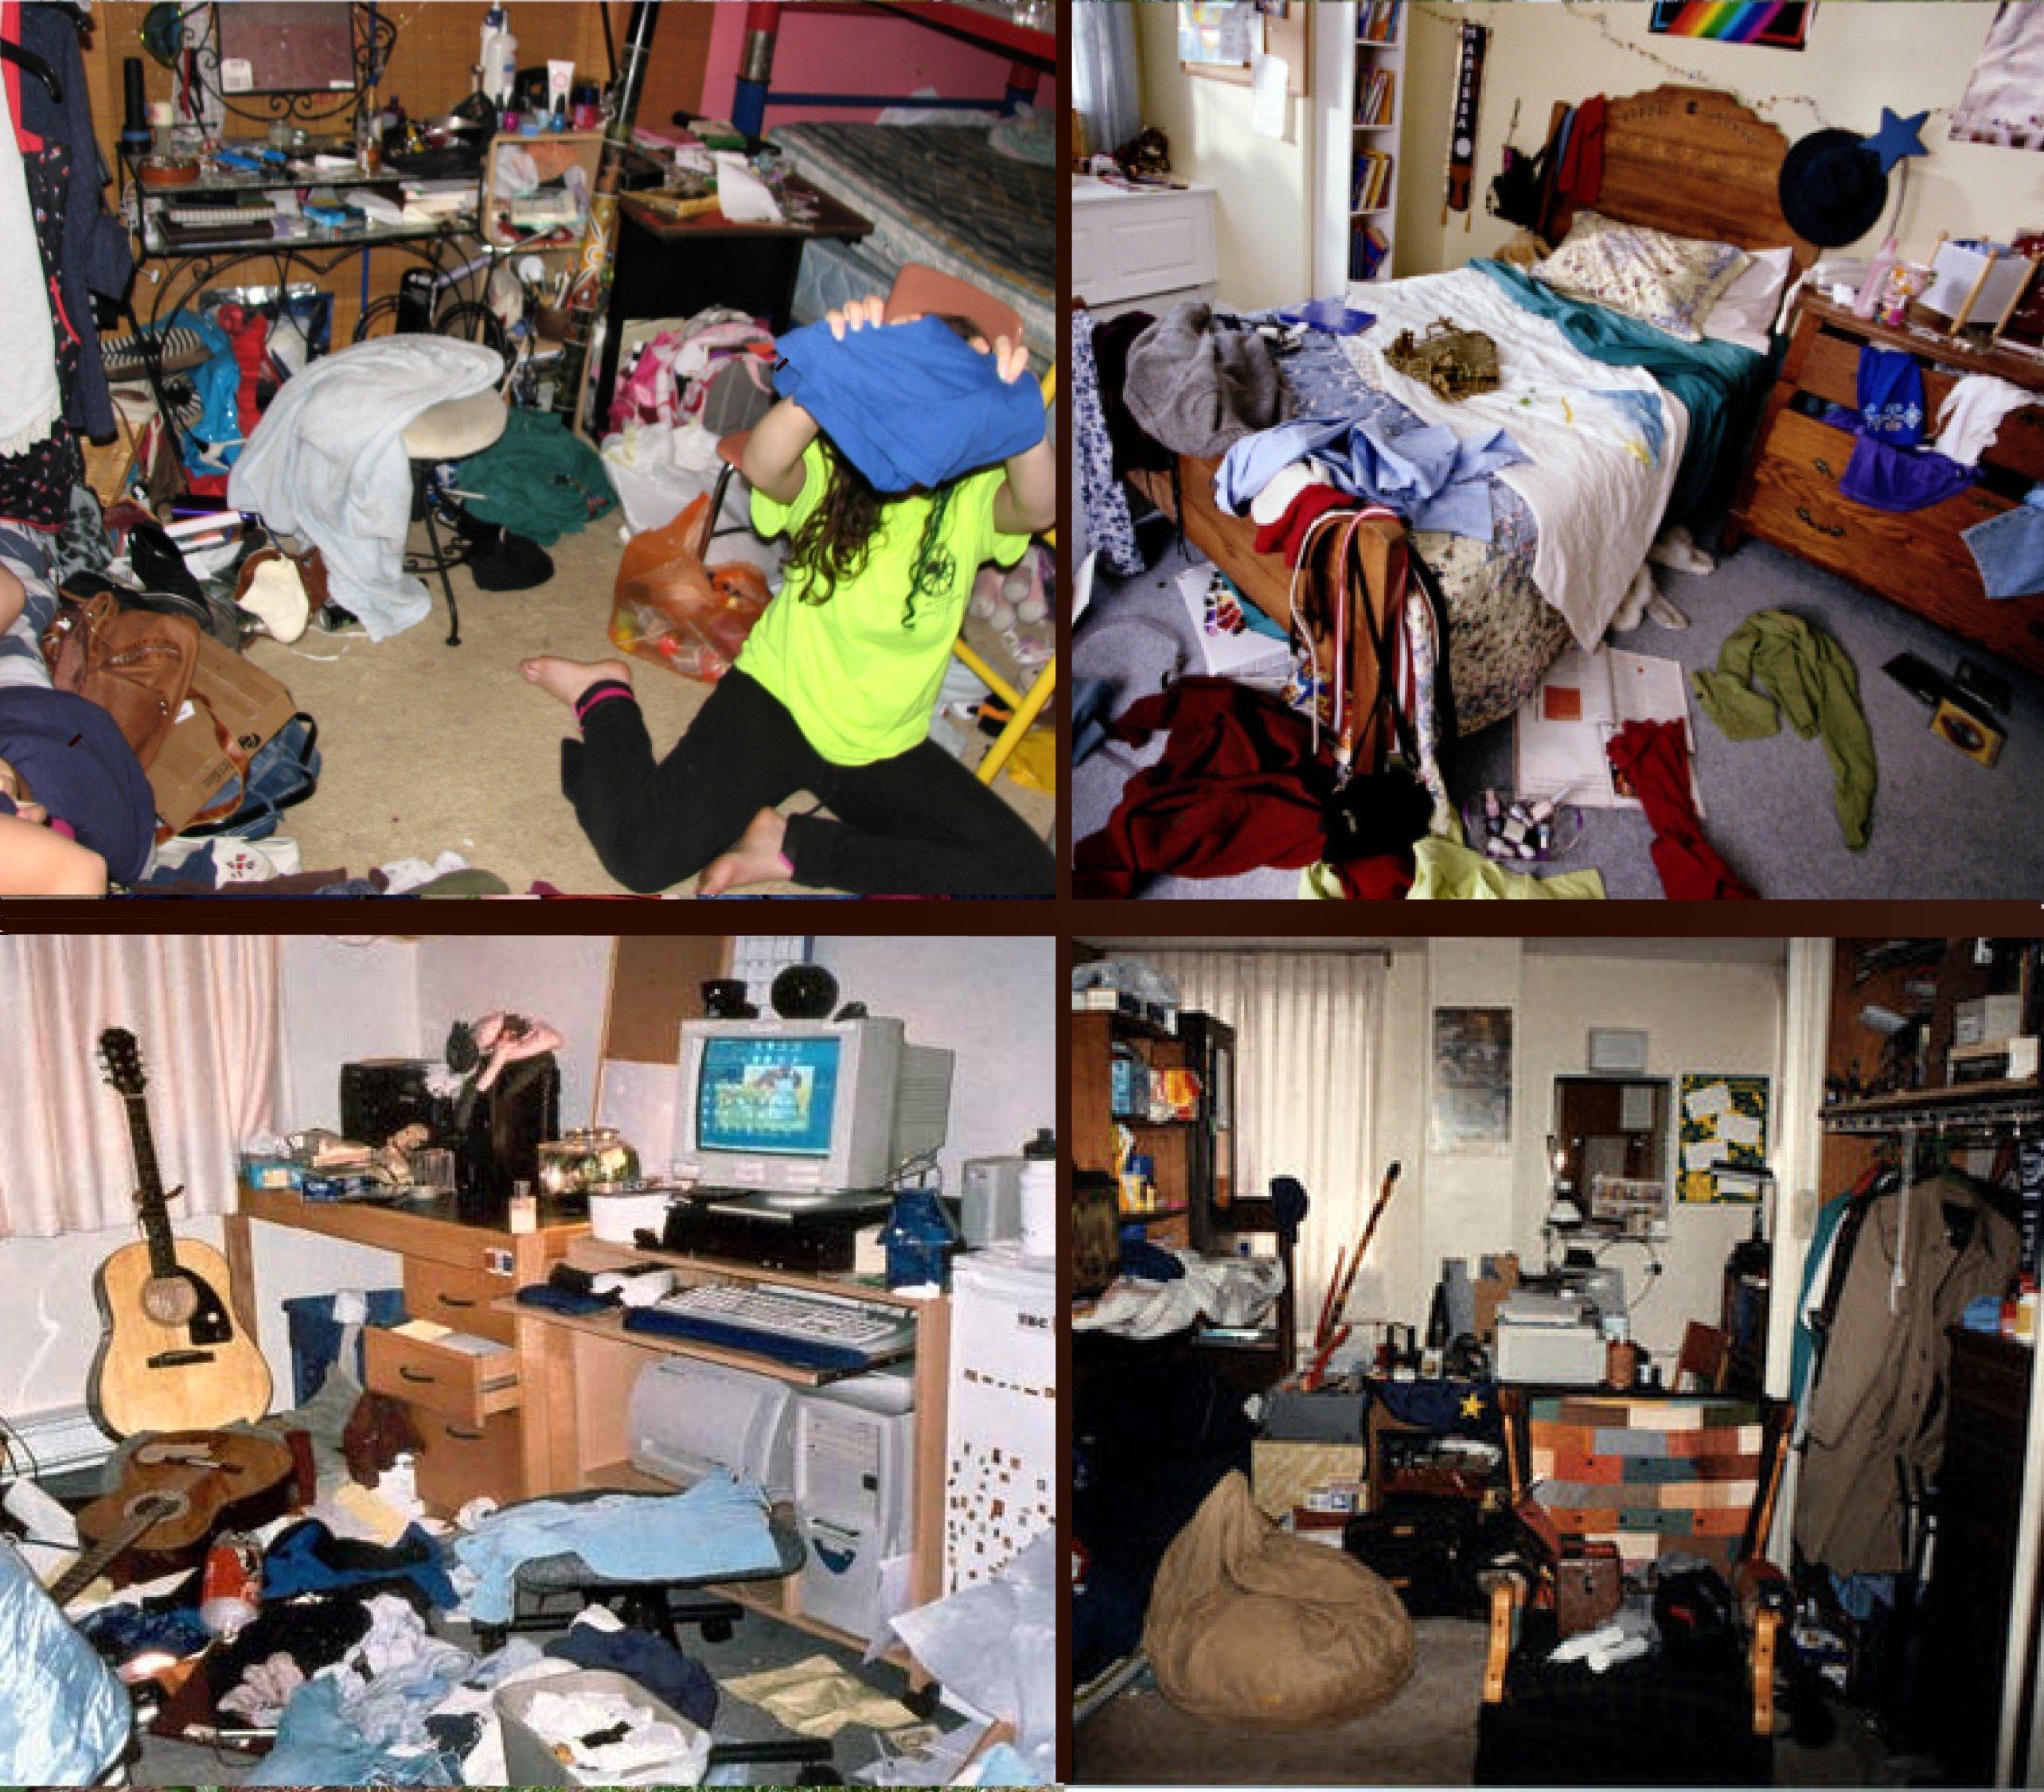 77622a5fa9bce9e1624b_8-2015_Cluttered_Rooms.jpg